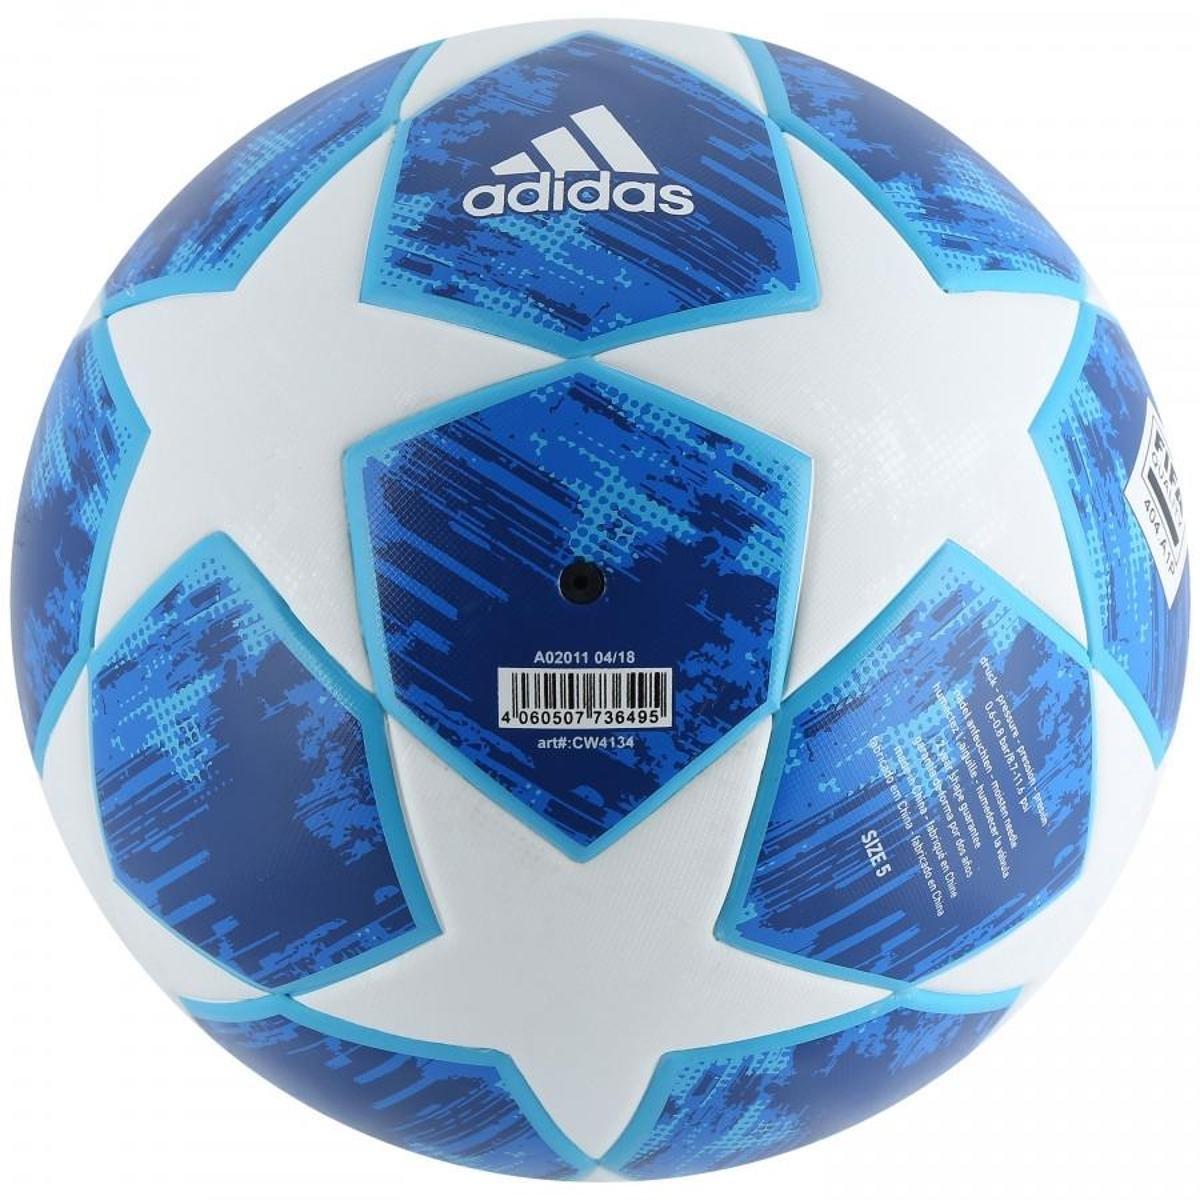 7b8174345 Bola de Futebol Campo Uefa Champions League Adidas Finale 18 Top ...